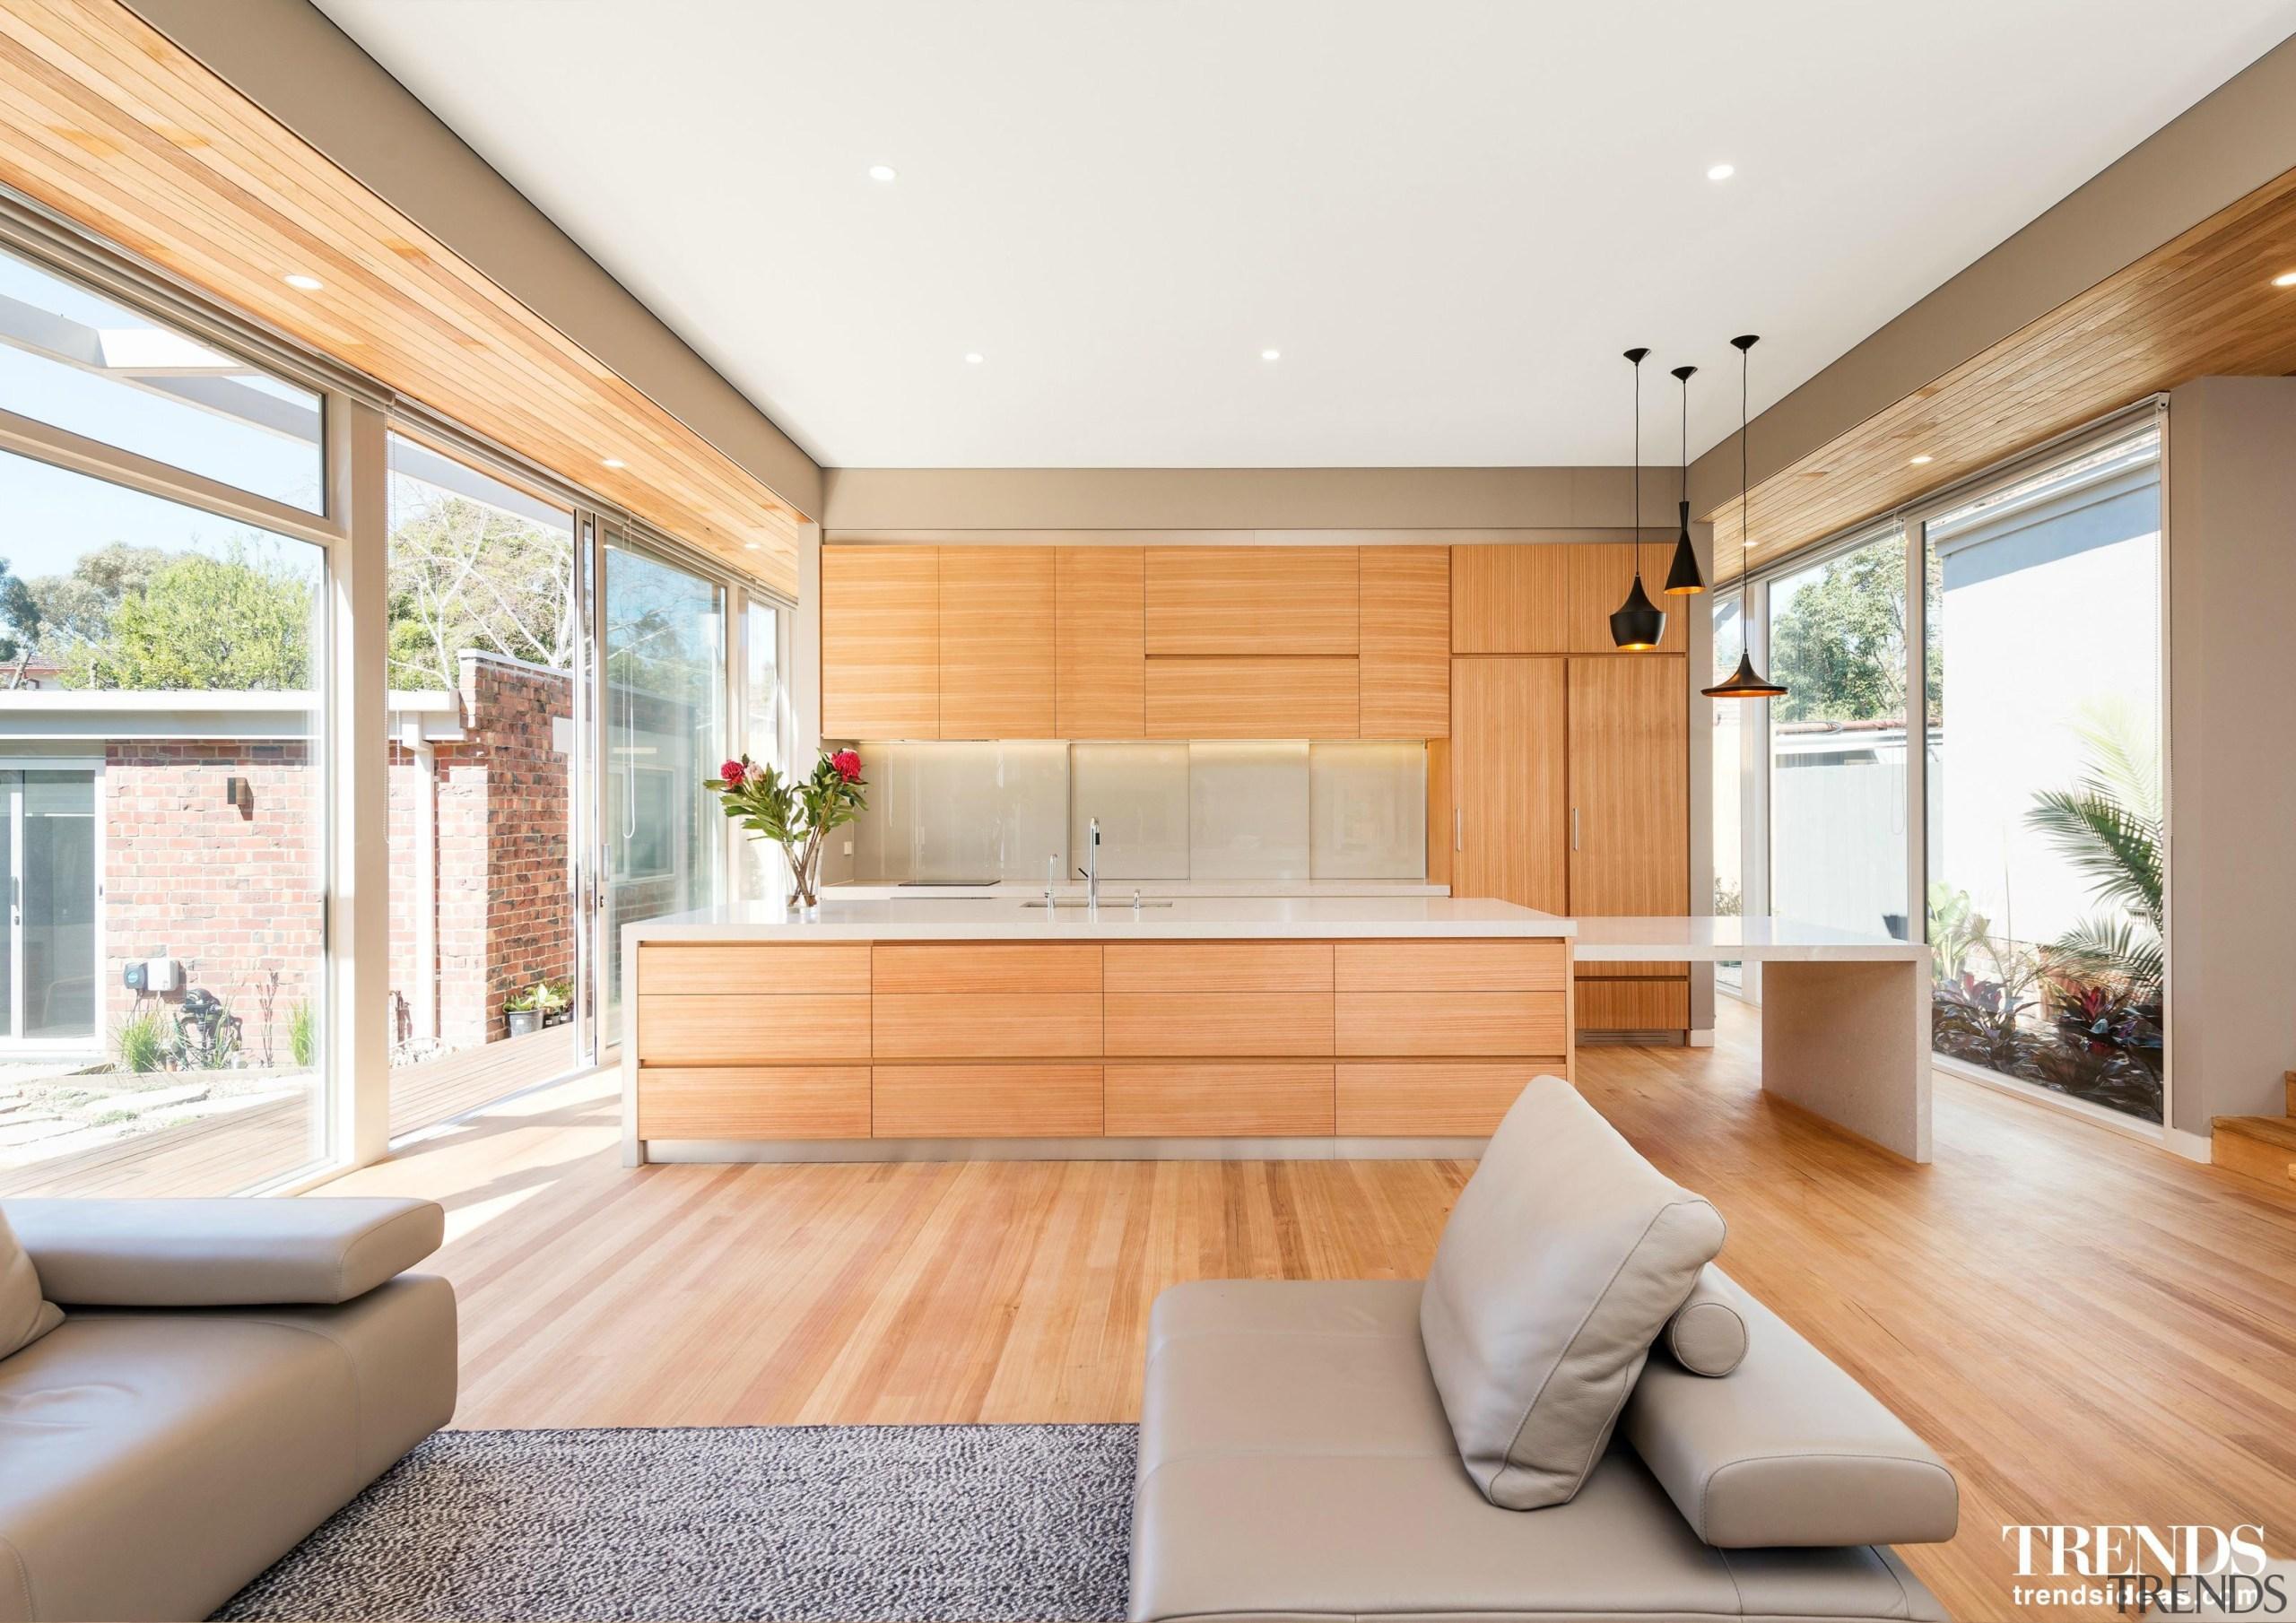 level architekture konstrukt - architecture | ceiling | architecture, ceiling, floor, hardwood, home, house, interior design, living room, property, real estate, window, wood, white, orange